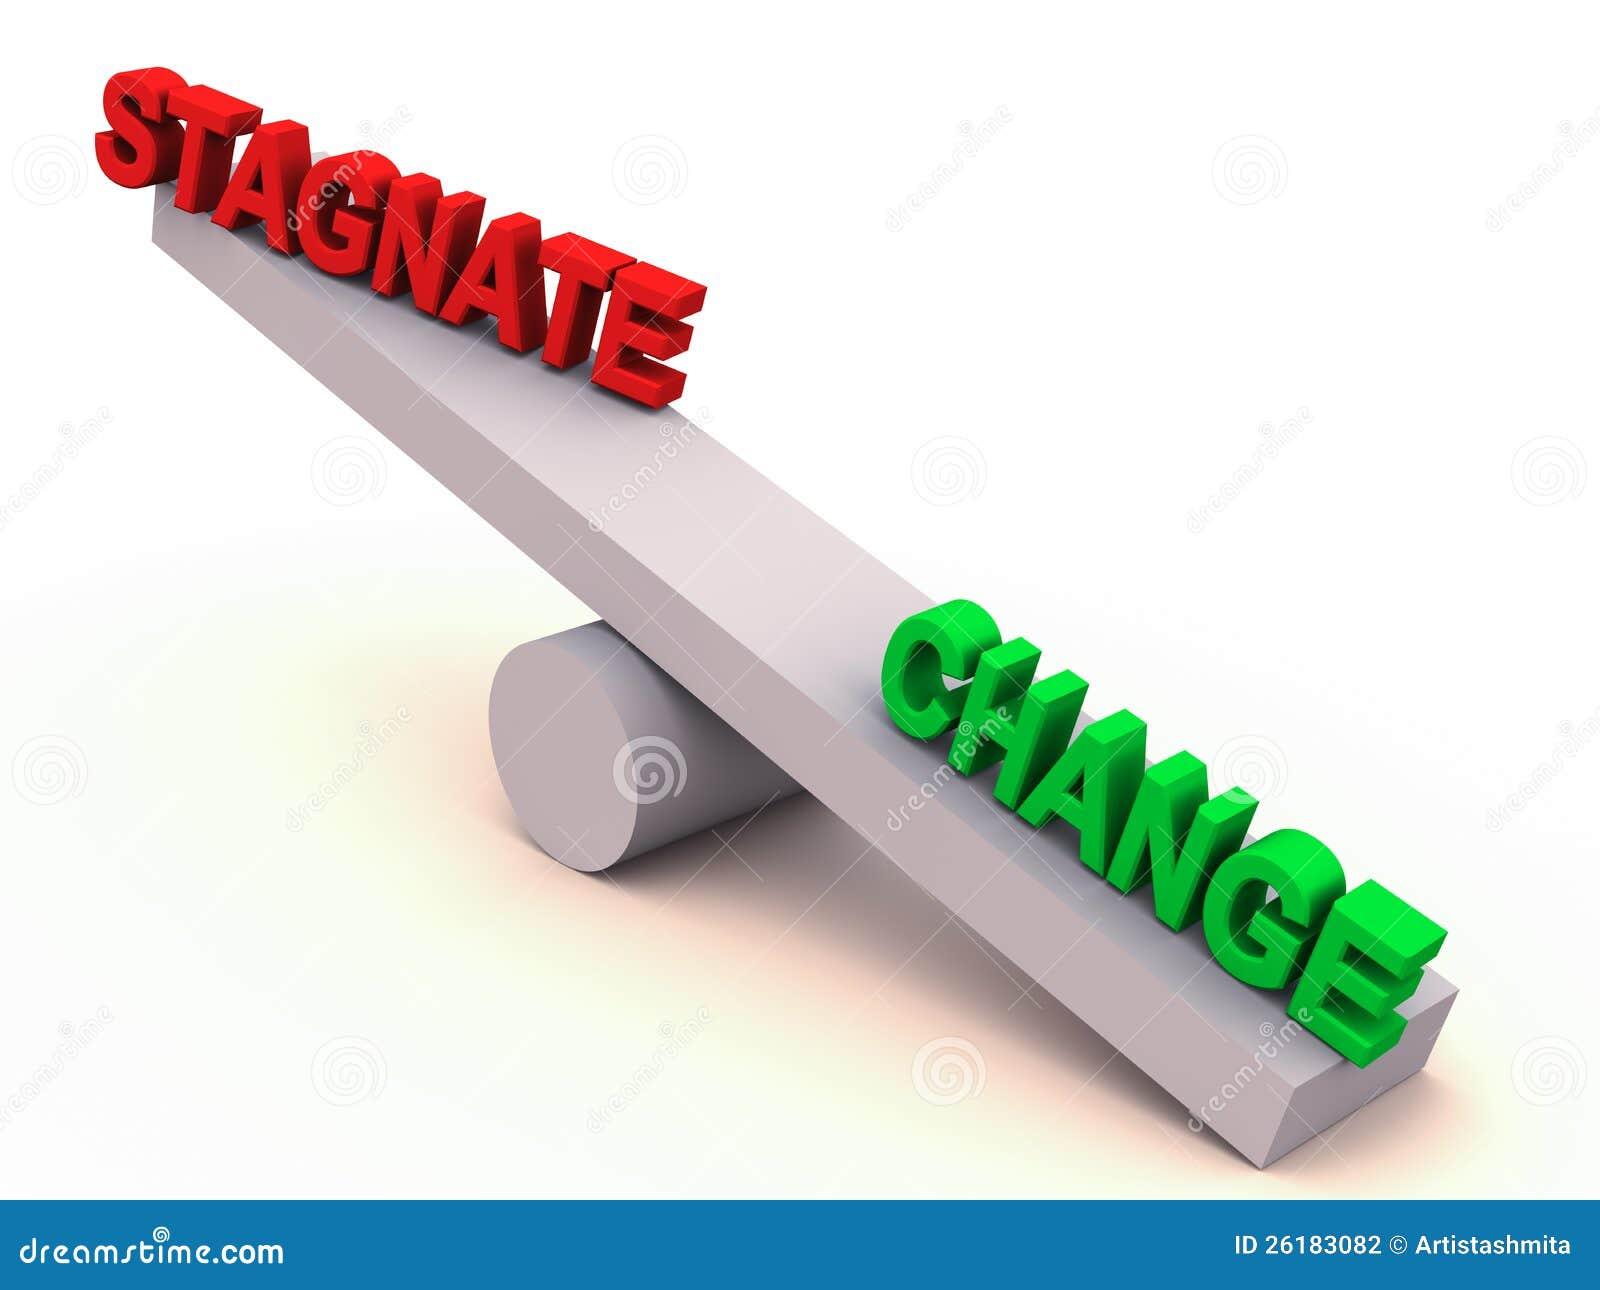 Change or stagnate balance